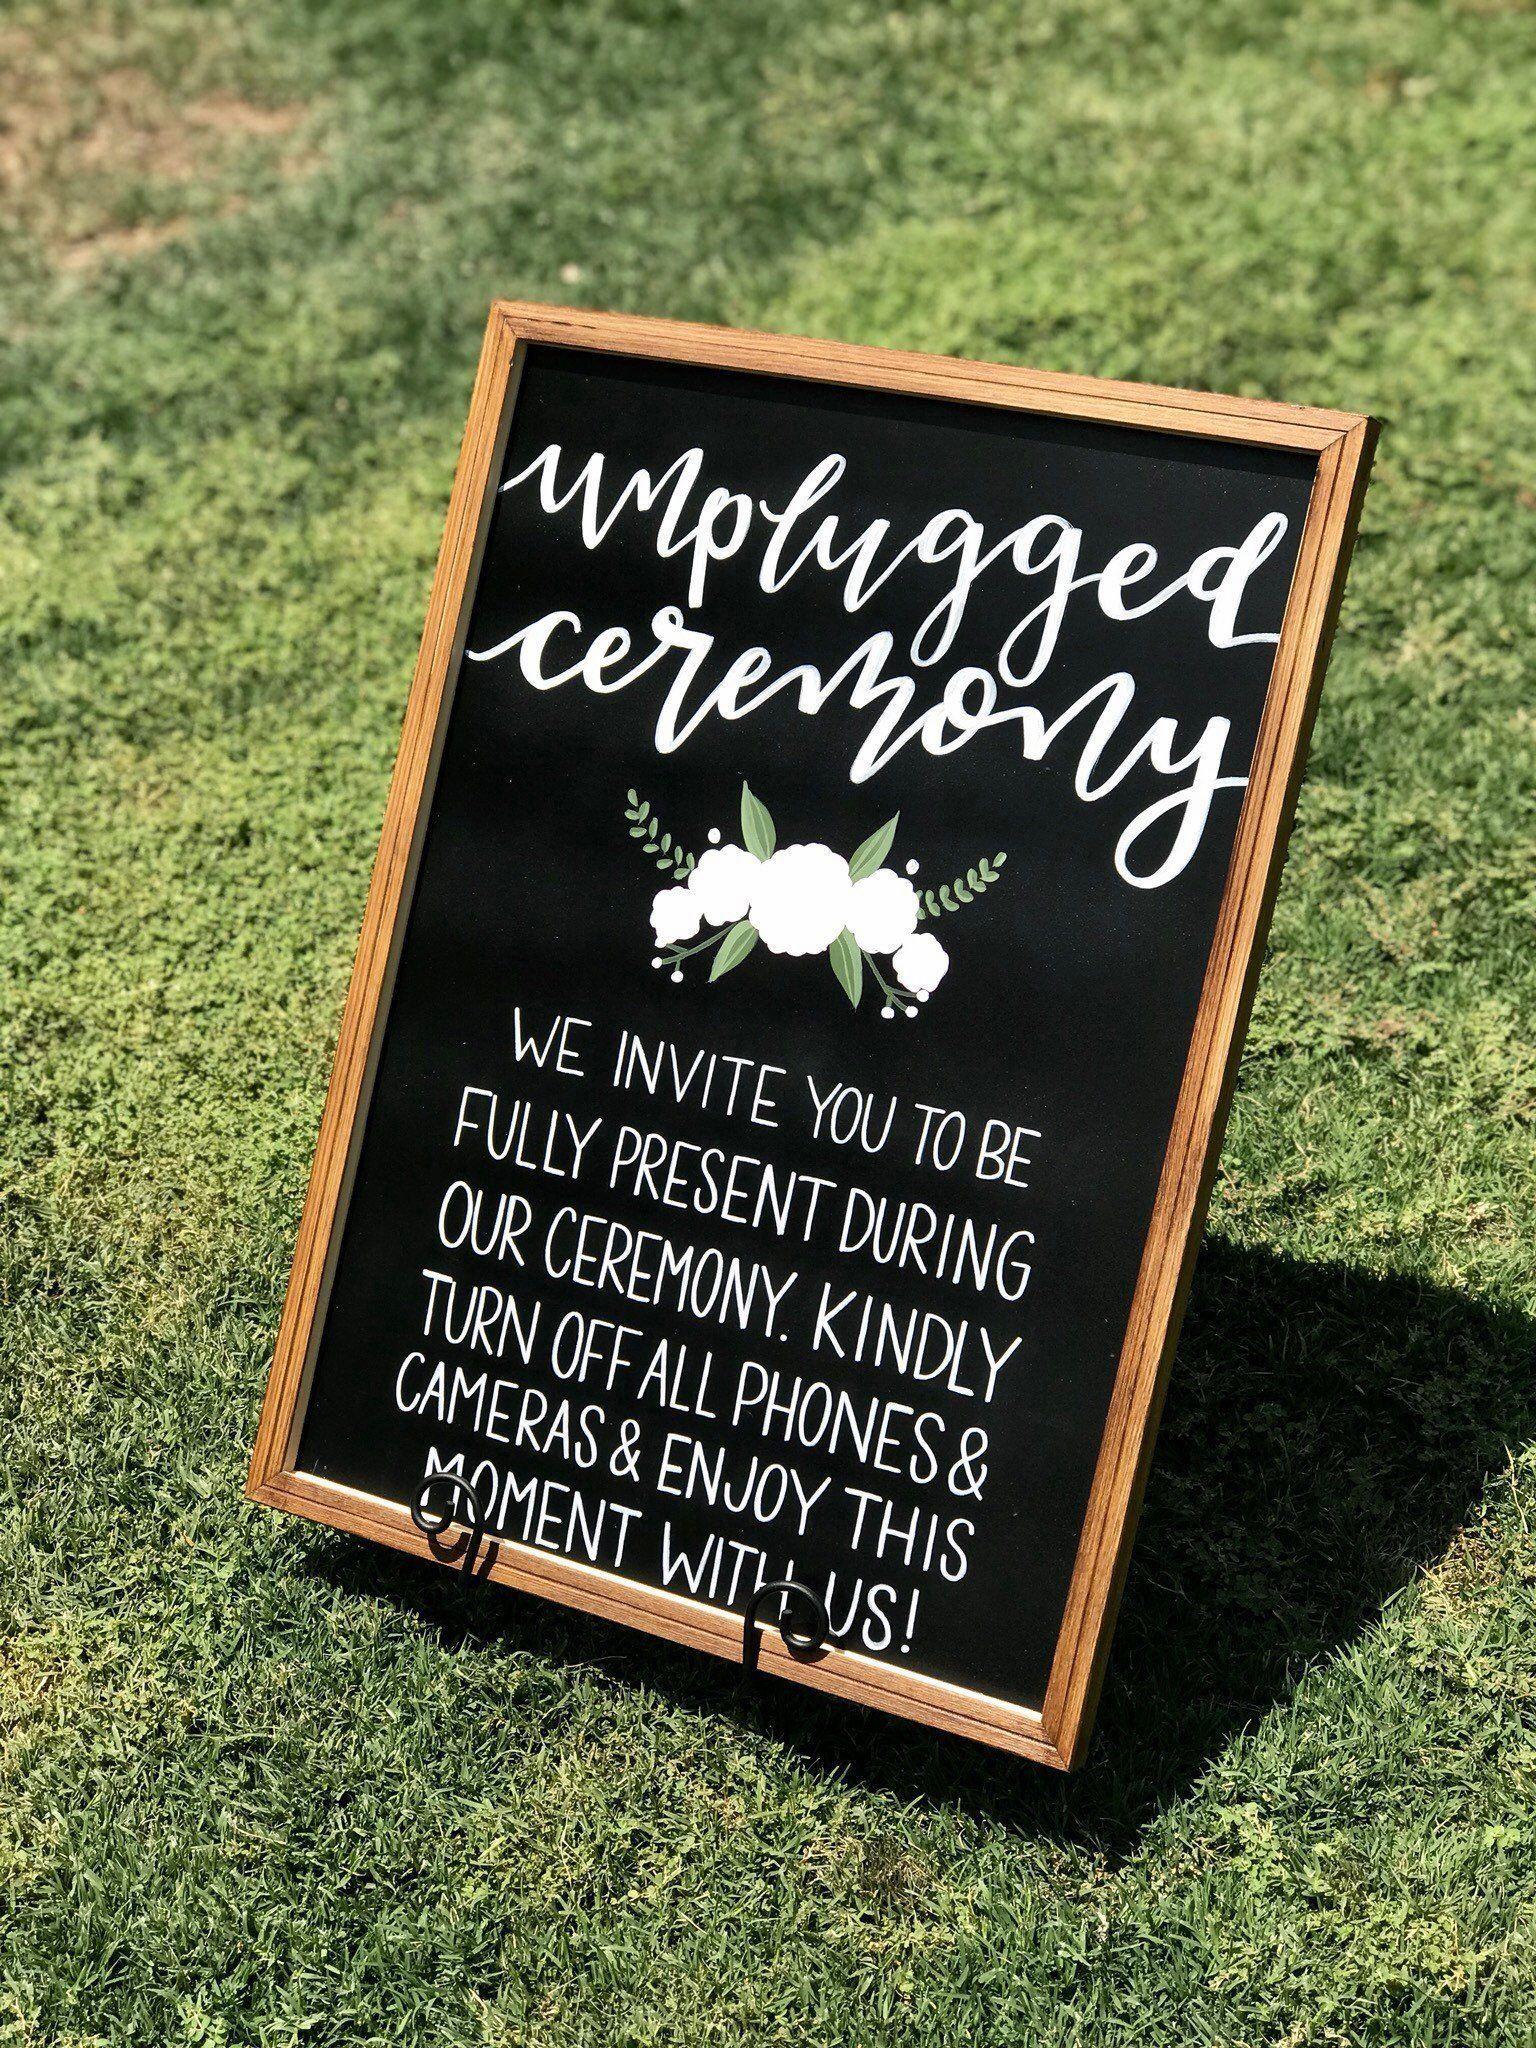 Unplugged Ceremony Sign Funny Weddingdecorationsclassy